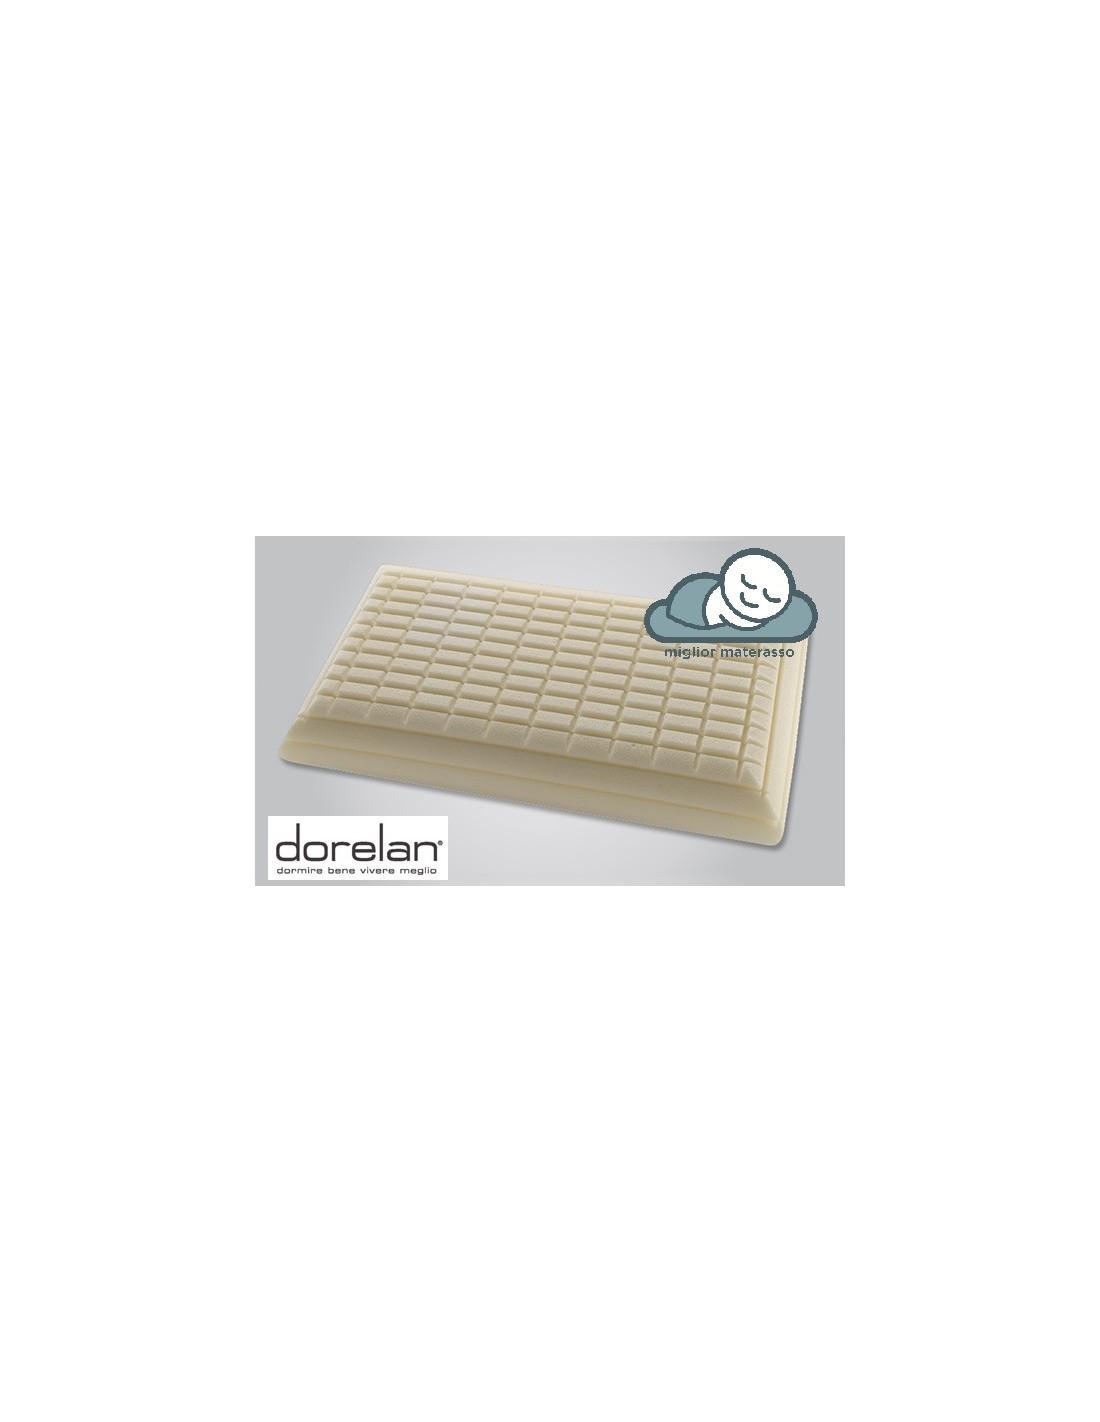 Cuscini Dorelan.Cuscino Memory Air Sense Dorelan In Offerta Vendita Online